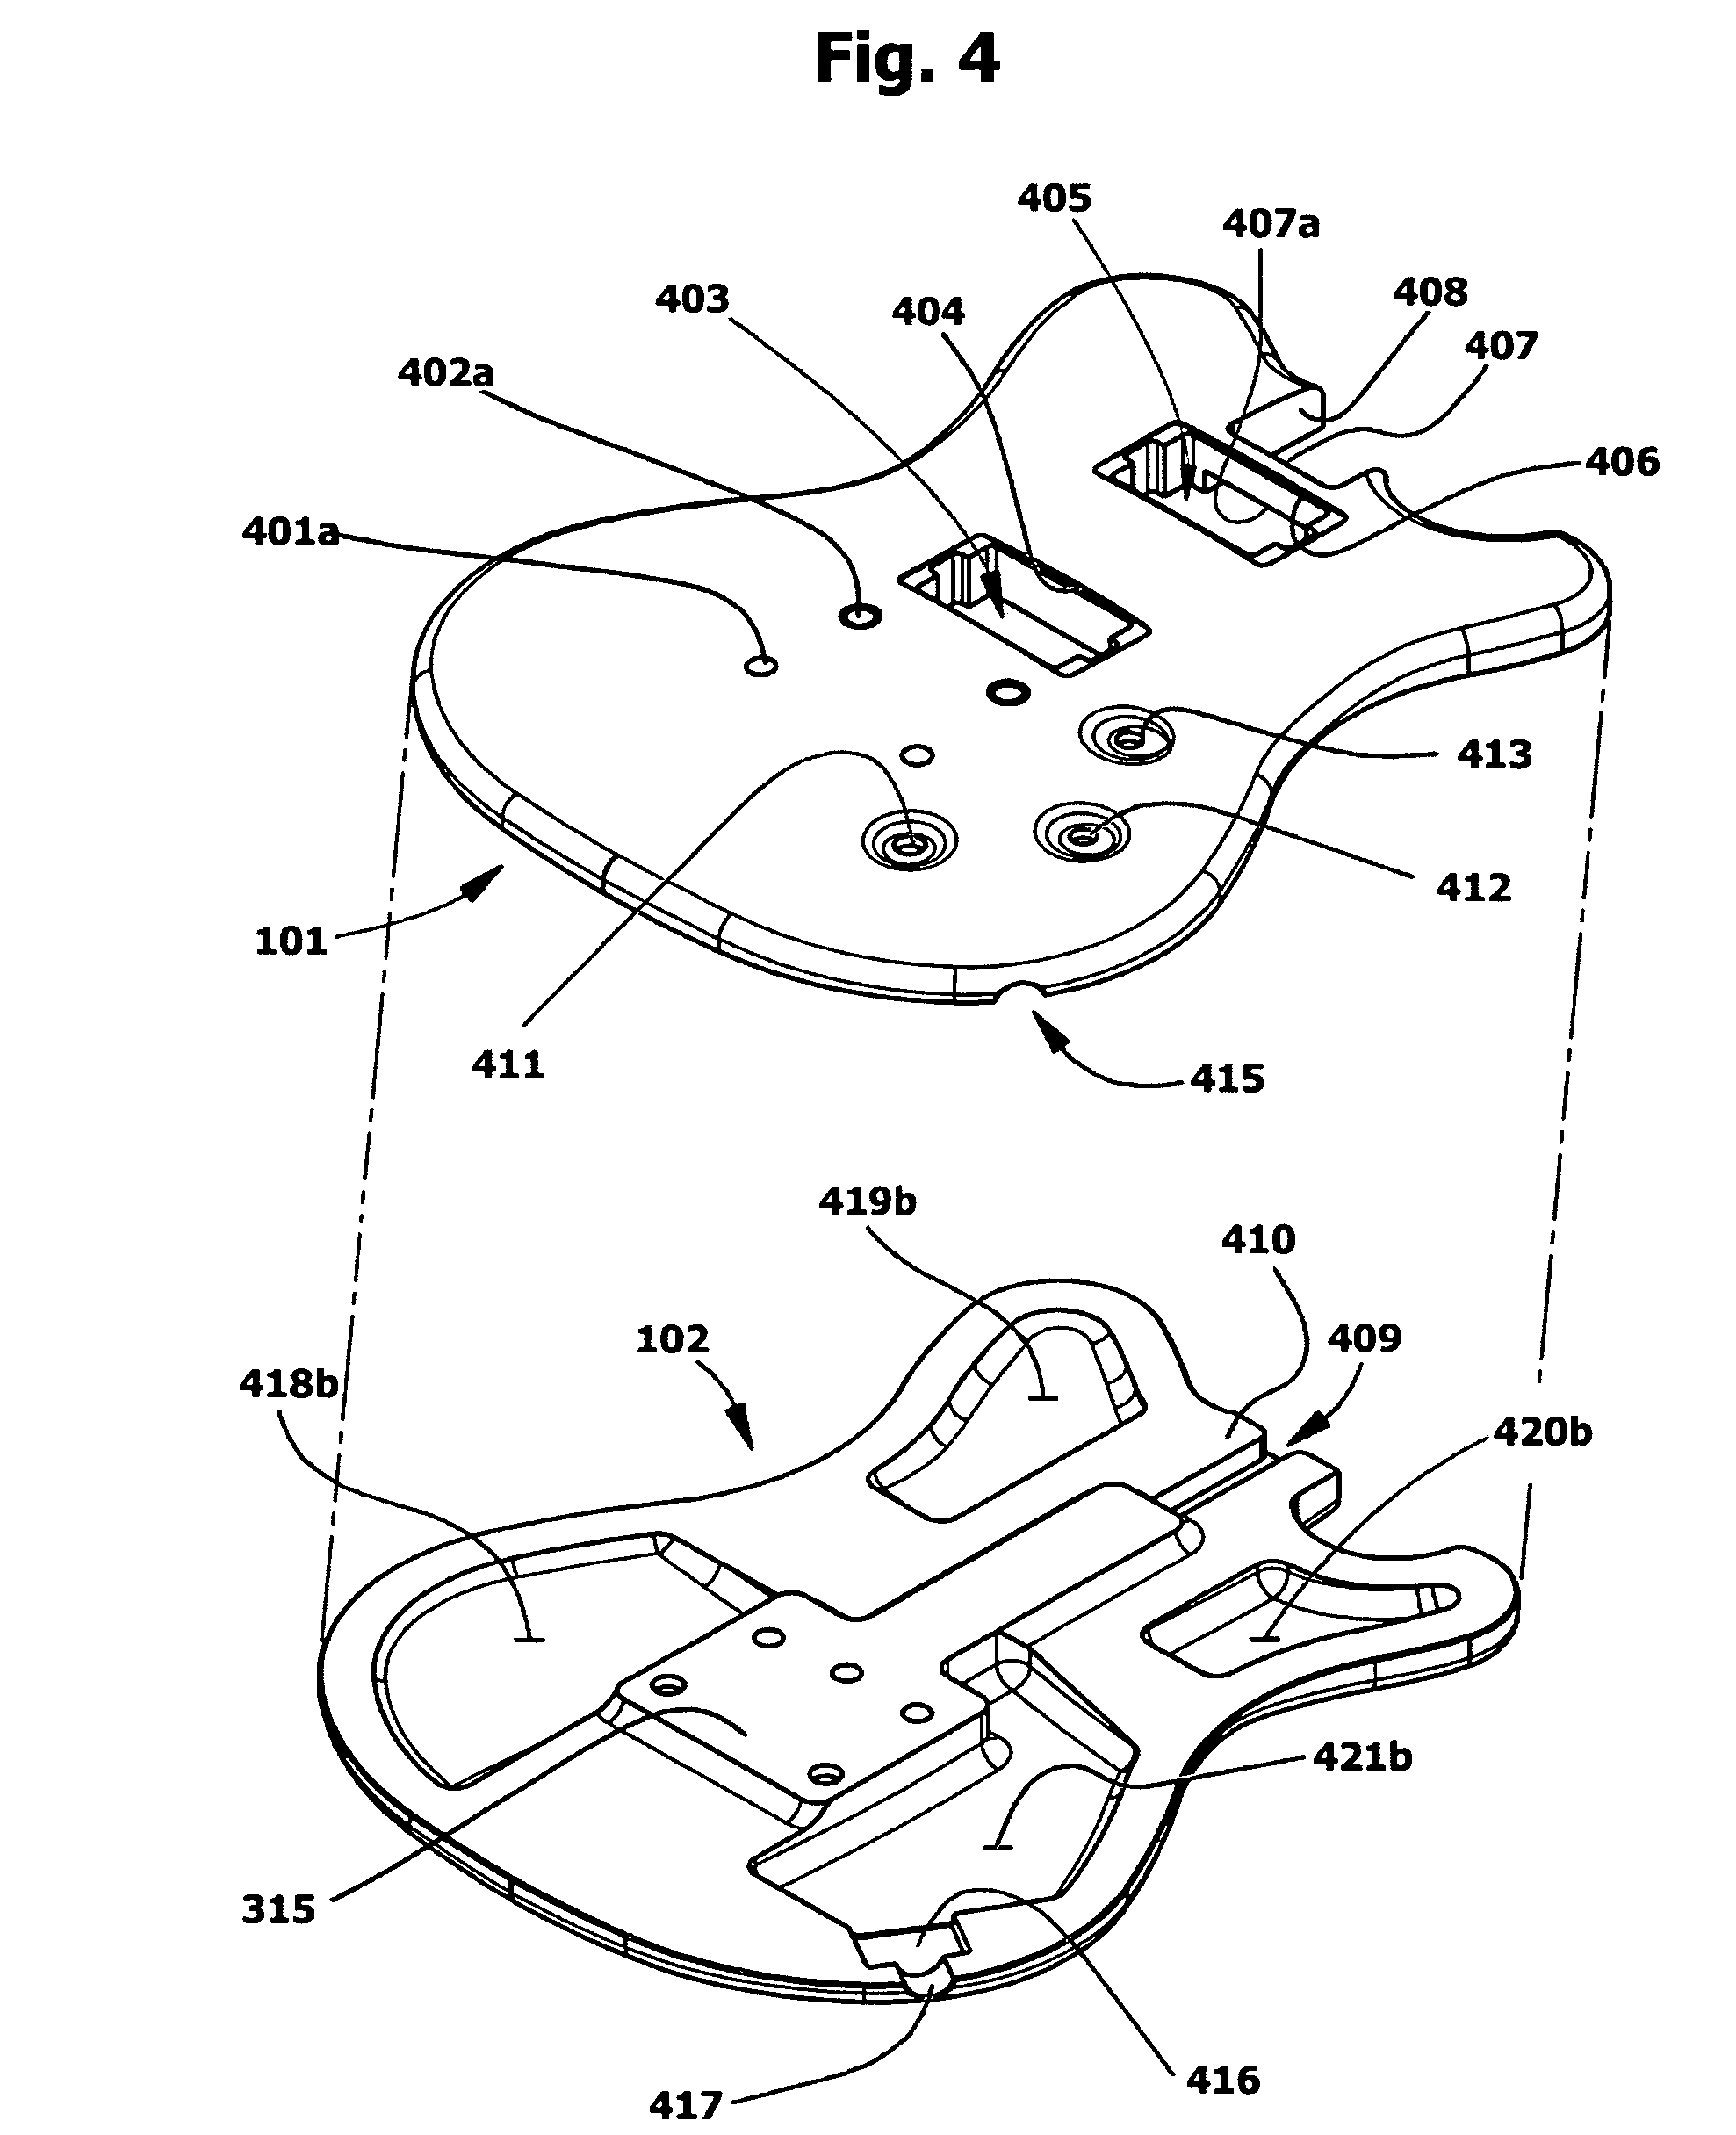 bc rich warlock wiring diagram bc discover your wiring diagram fender j b wiring diagram